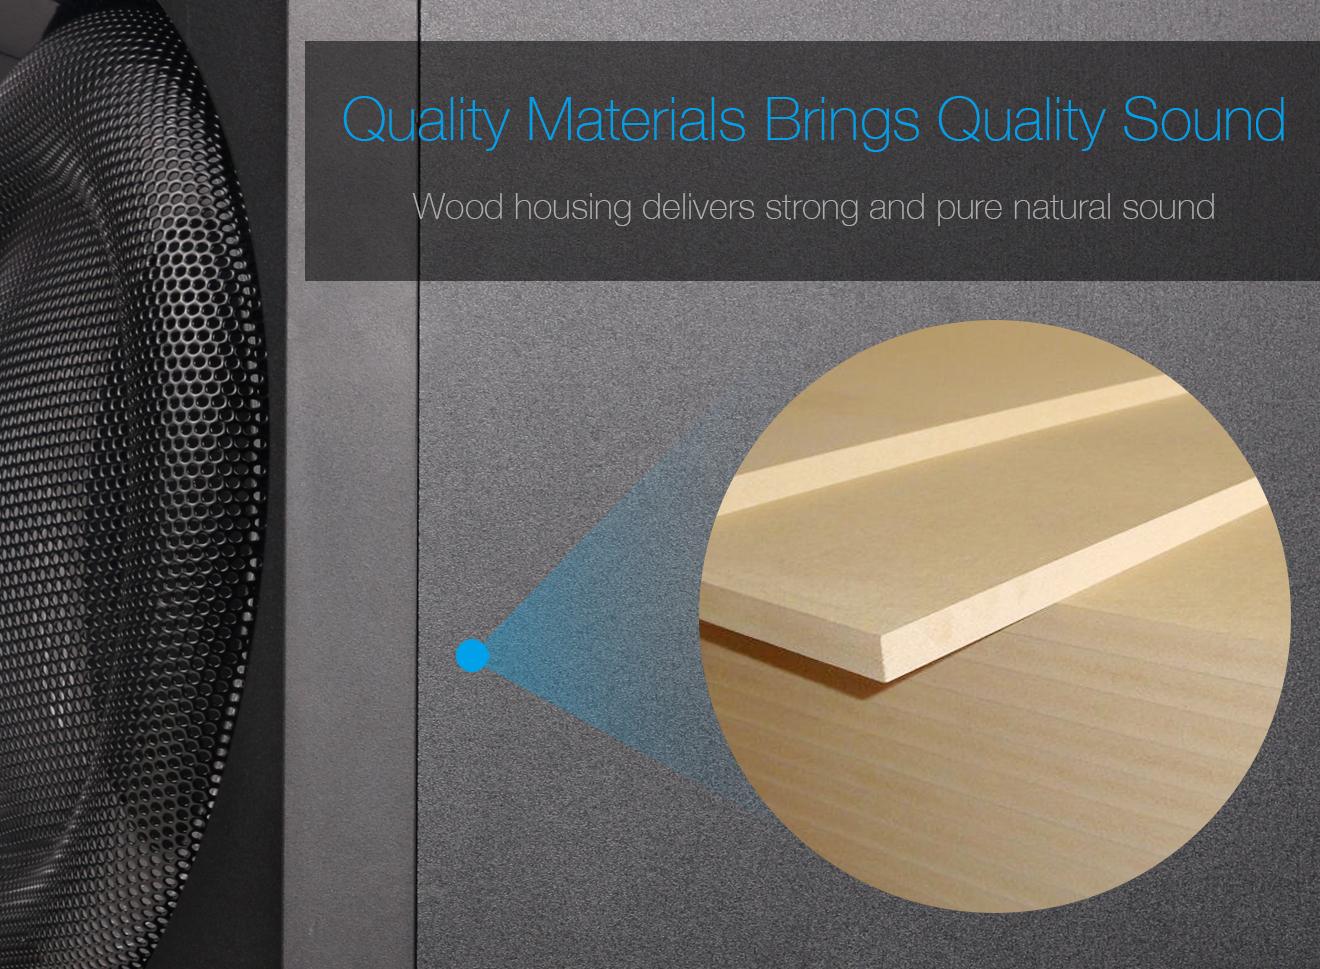 Quality Materials Brings Quality Sound